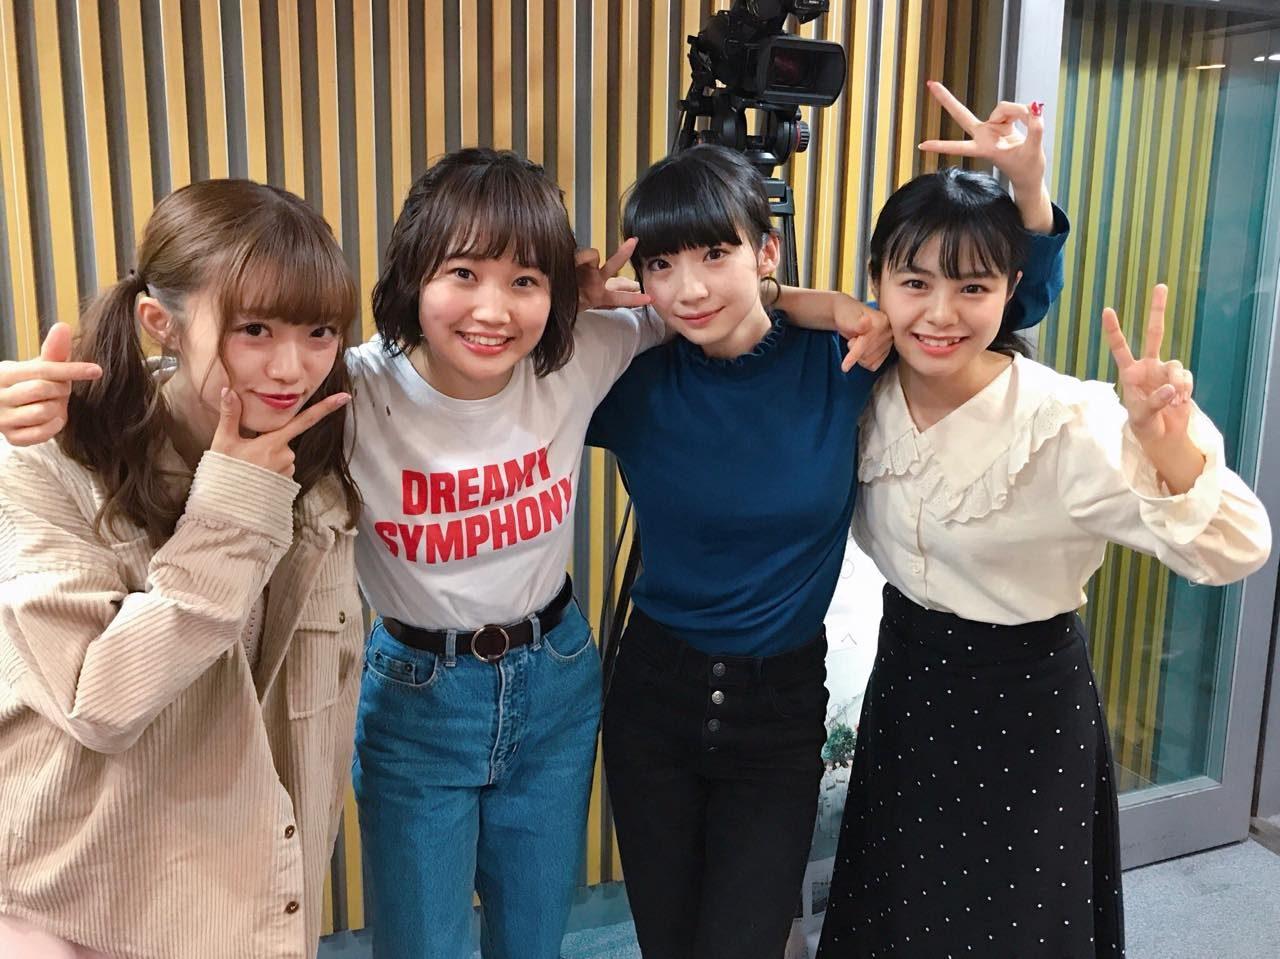 「NGT48のオールナイトニッポン」オフショット * 荻野由佳・本間日陽・中井りか・山田野絵